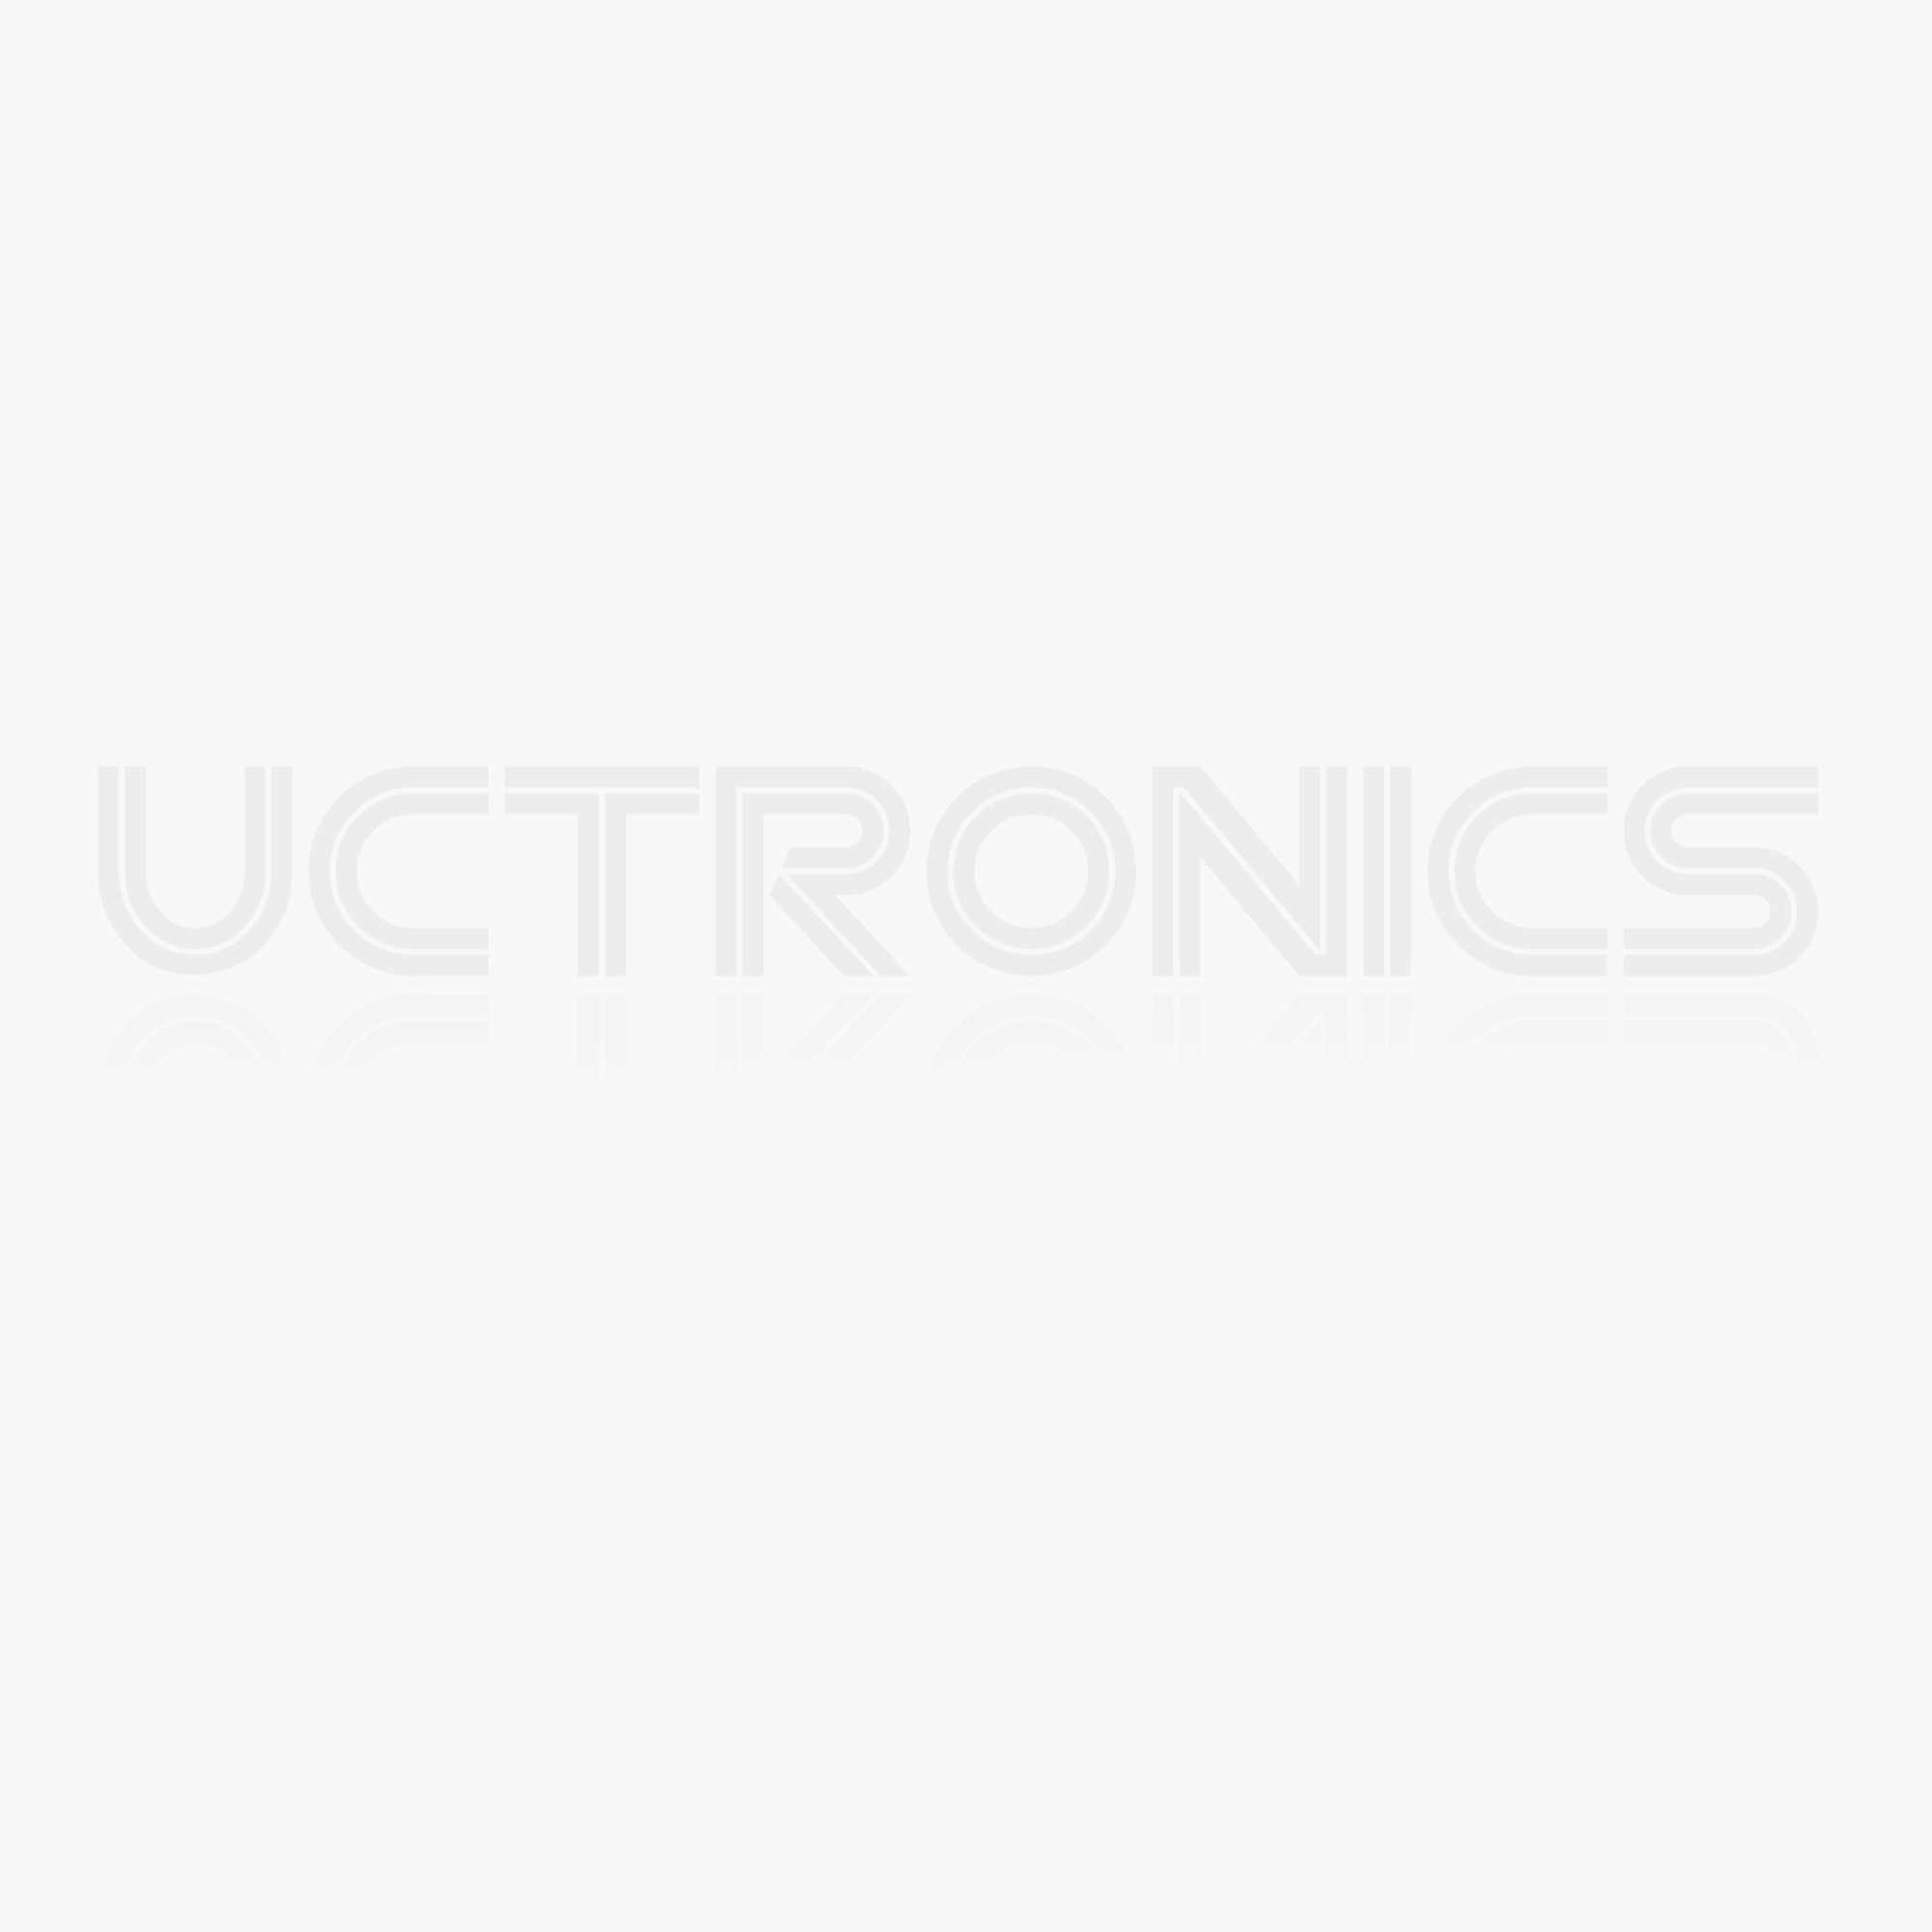 AC-DC 12V 400mA 4.5W Power Supply Buck Converter Step Down Module for Arduino